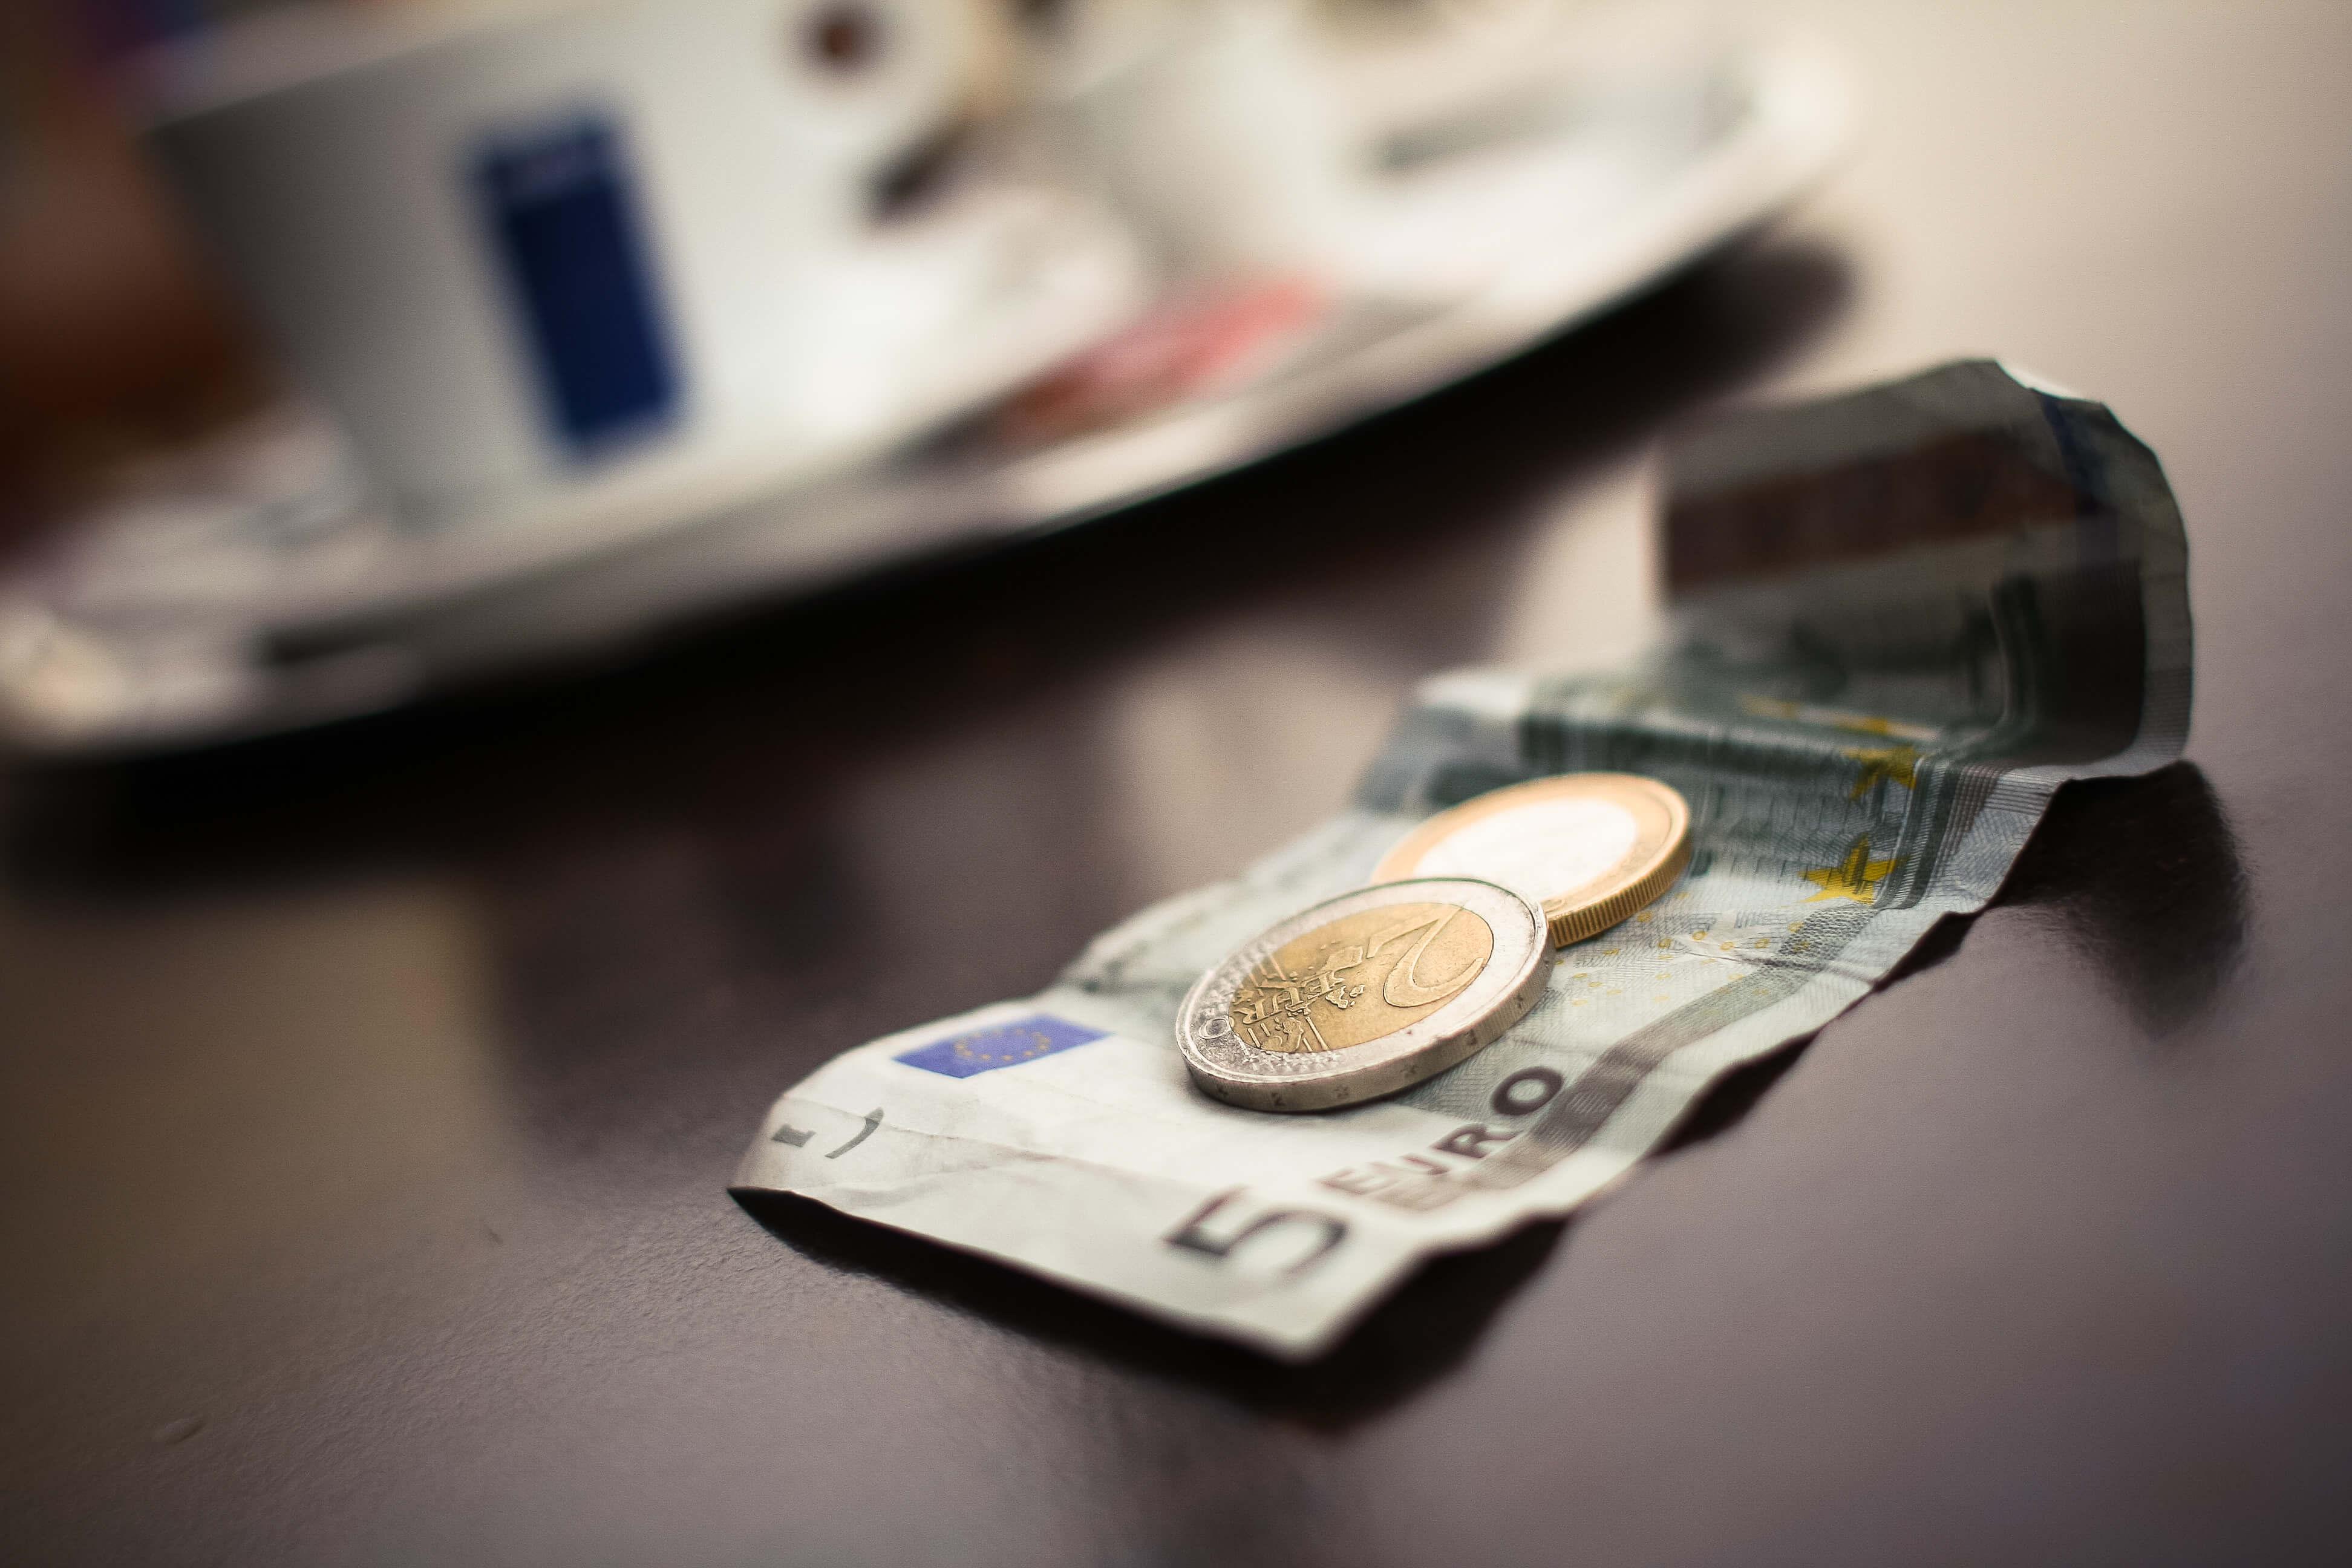 cash-card-travel